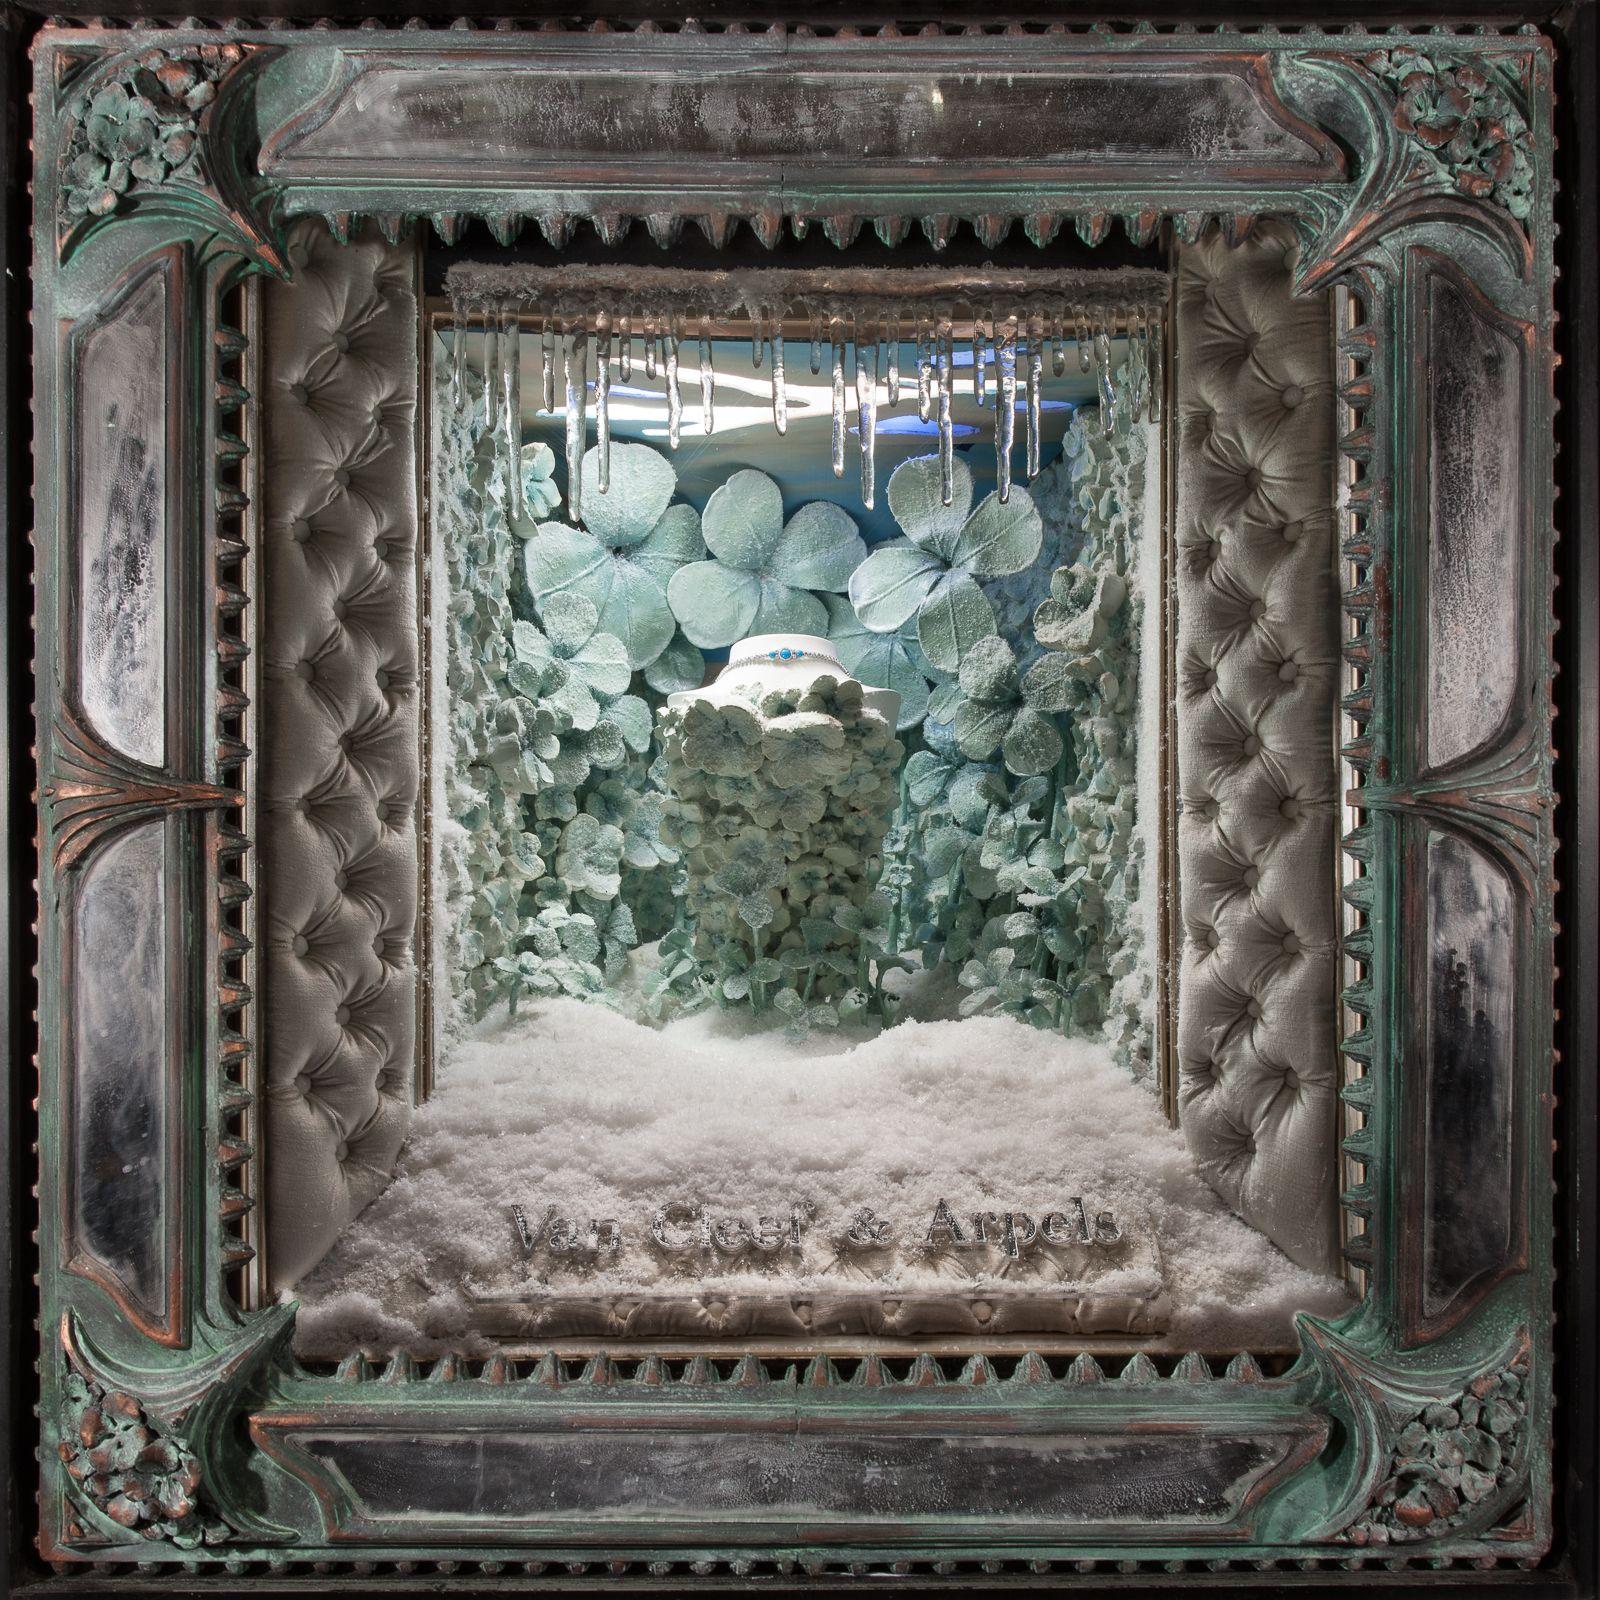 Window display ideas for jewellery  holiday season window displays  by douglas little van cleef